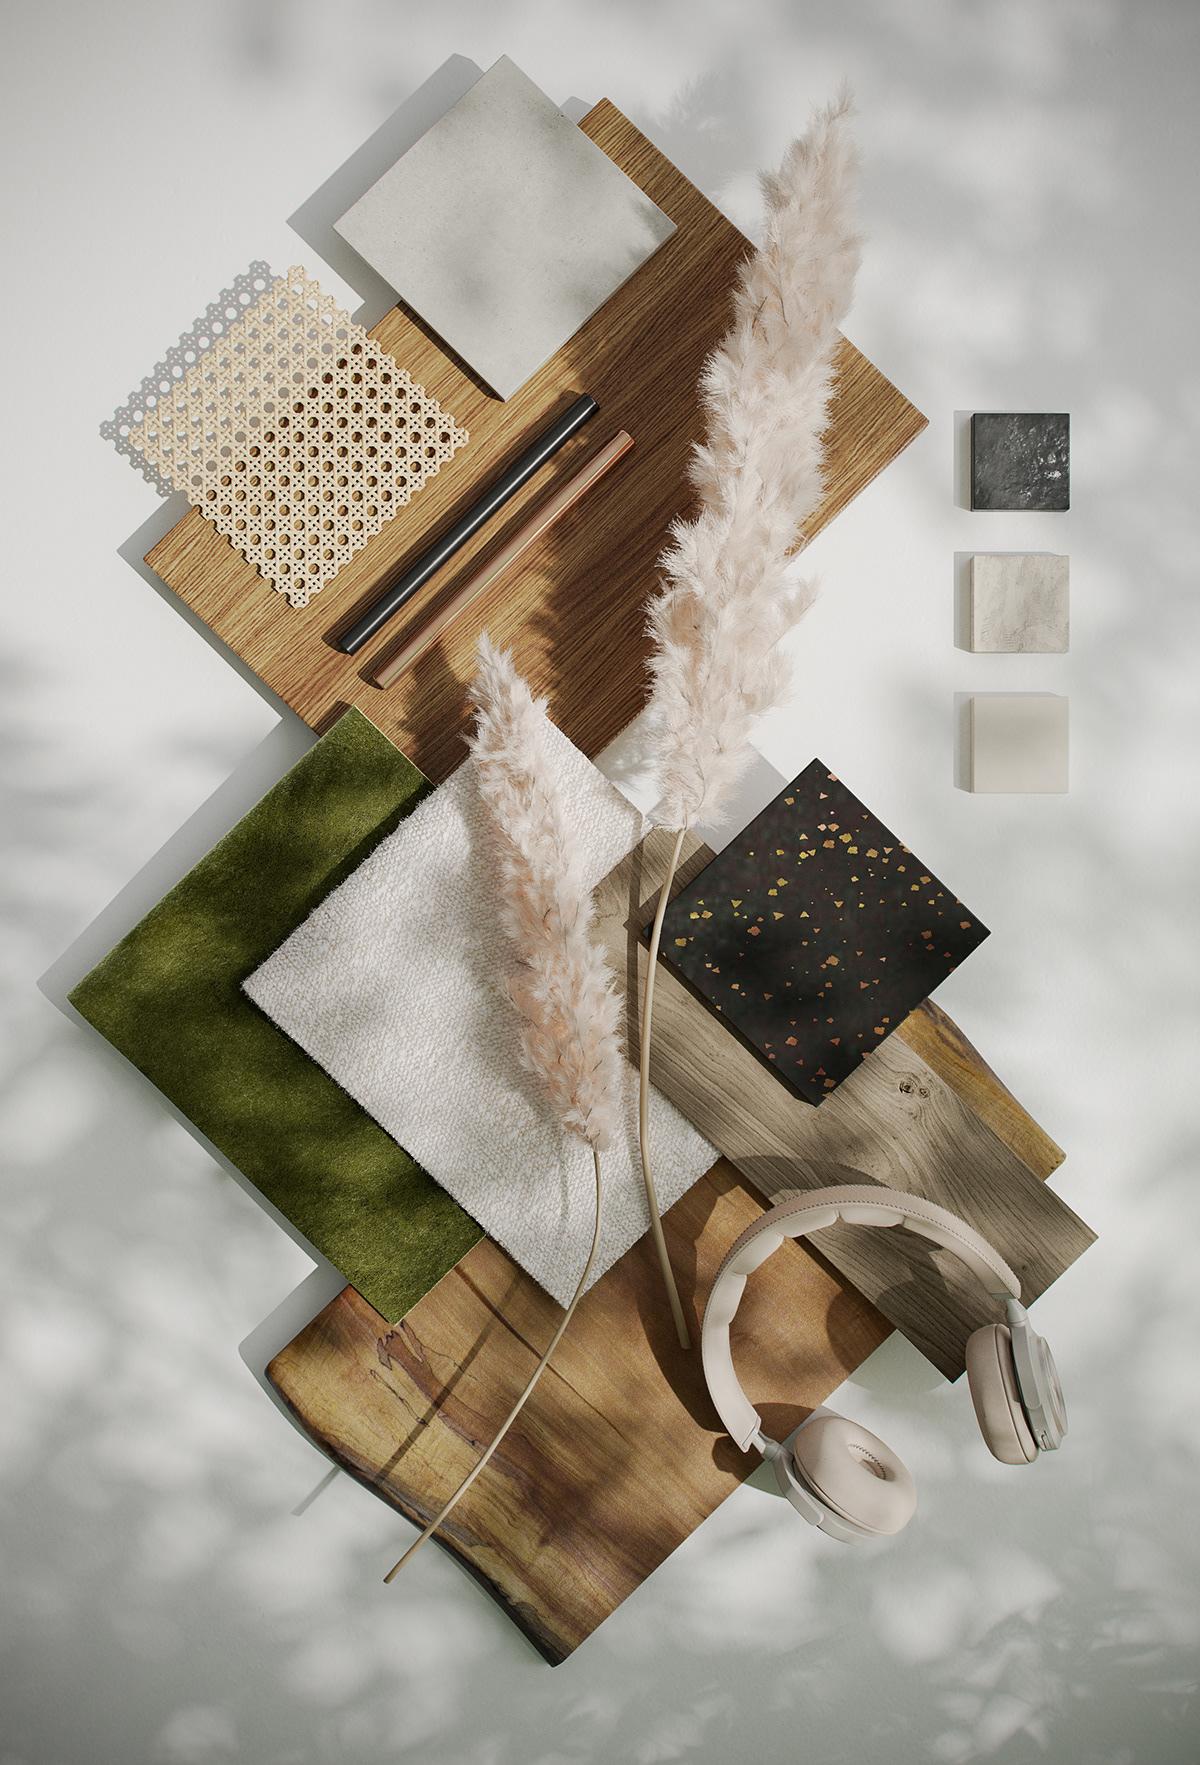 3D architecture art CGI design Digital Art  interior design  Render rendering visualisation